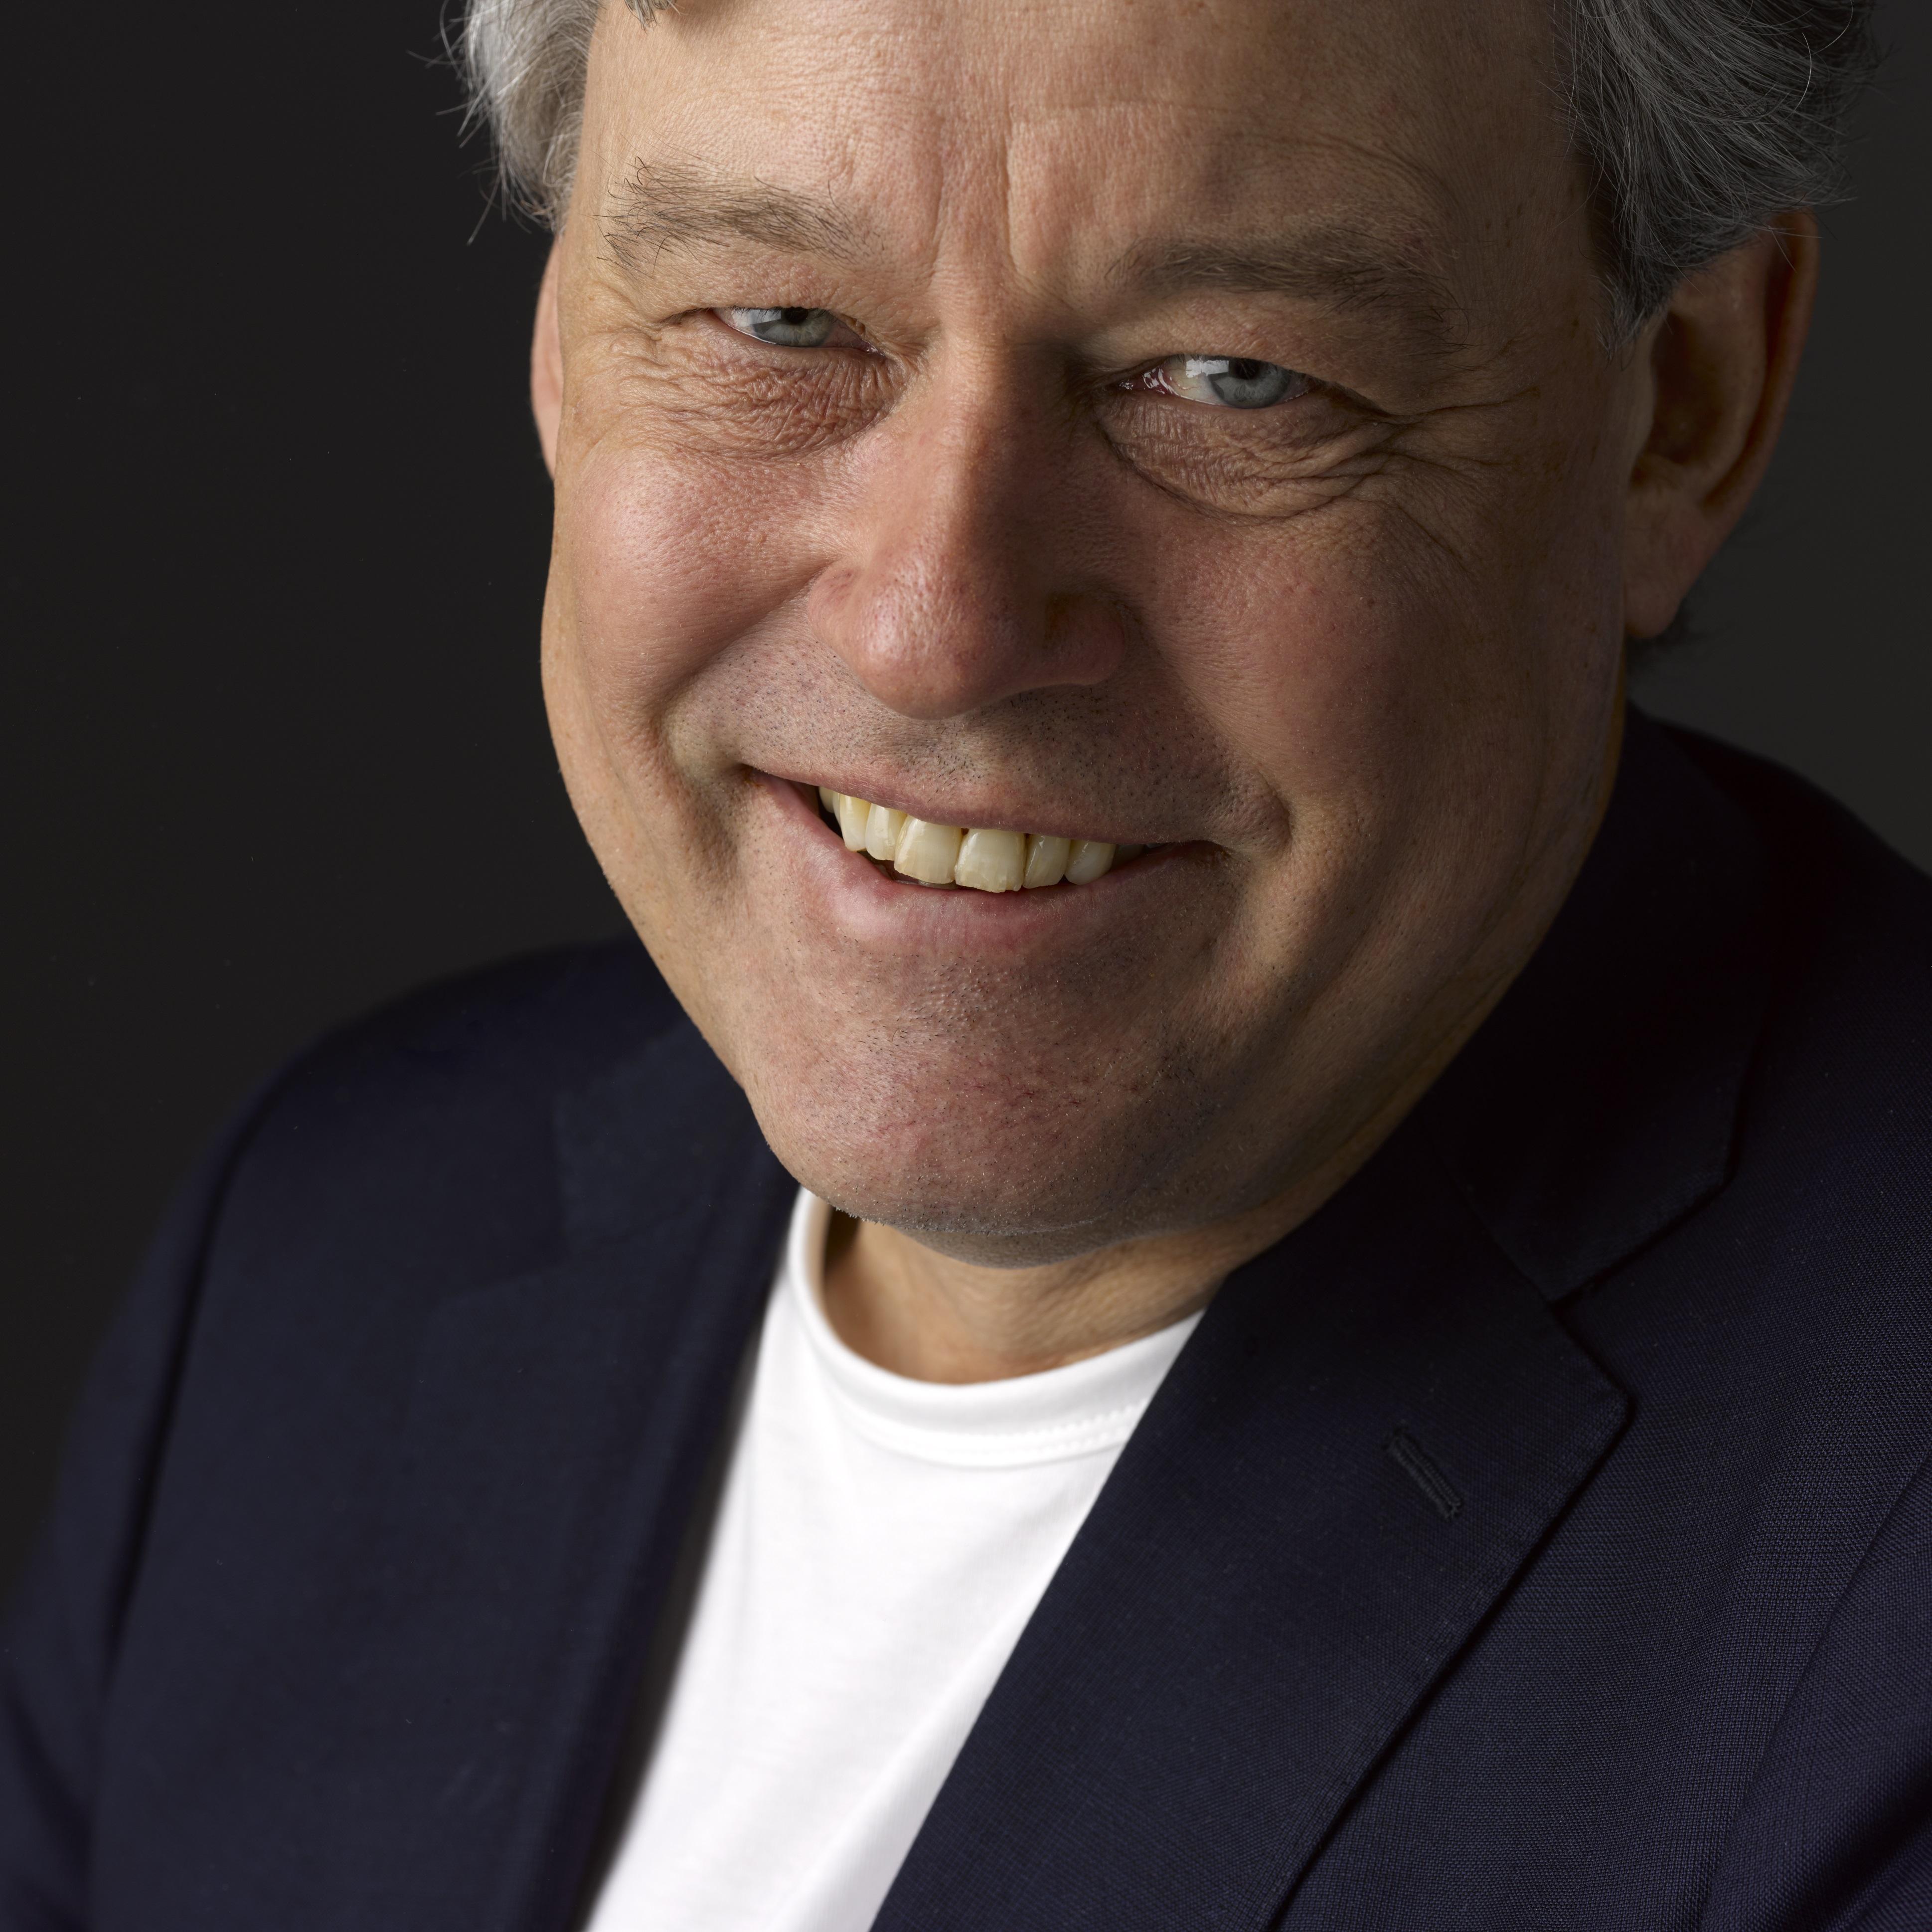 Portret Kleur Charles Groenhuijsen_2.4MB